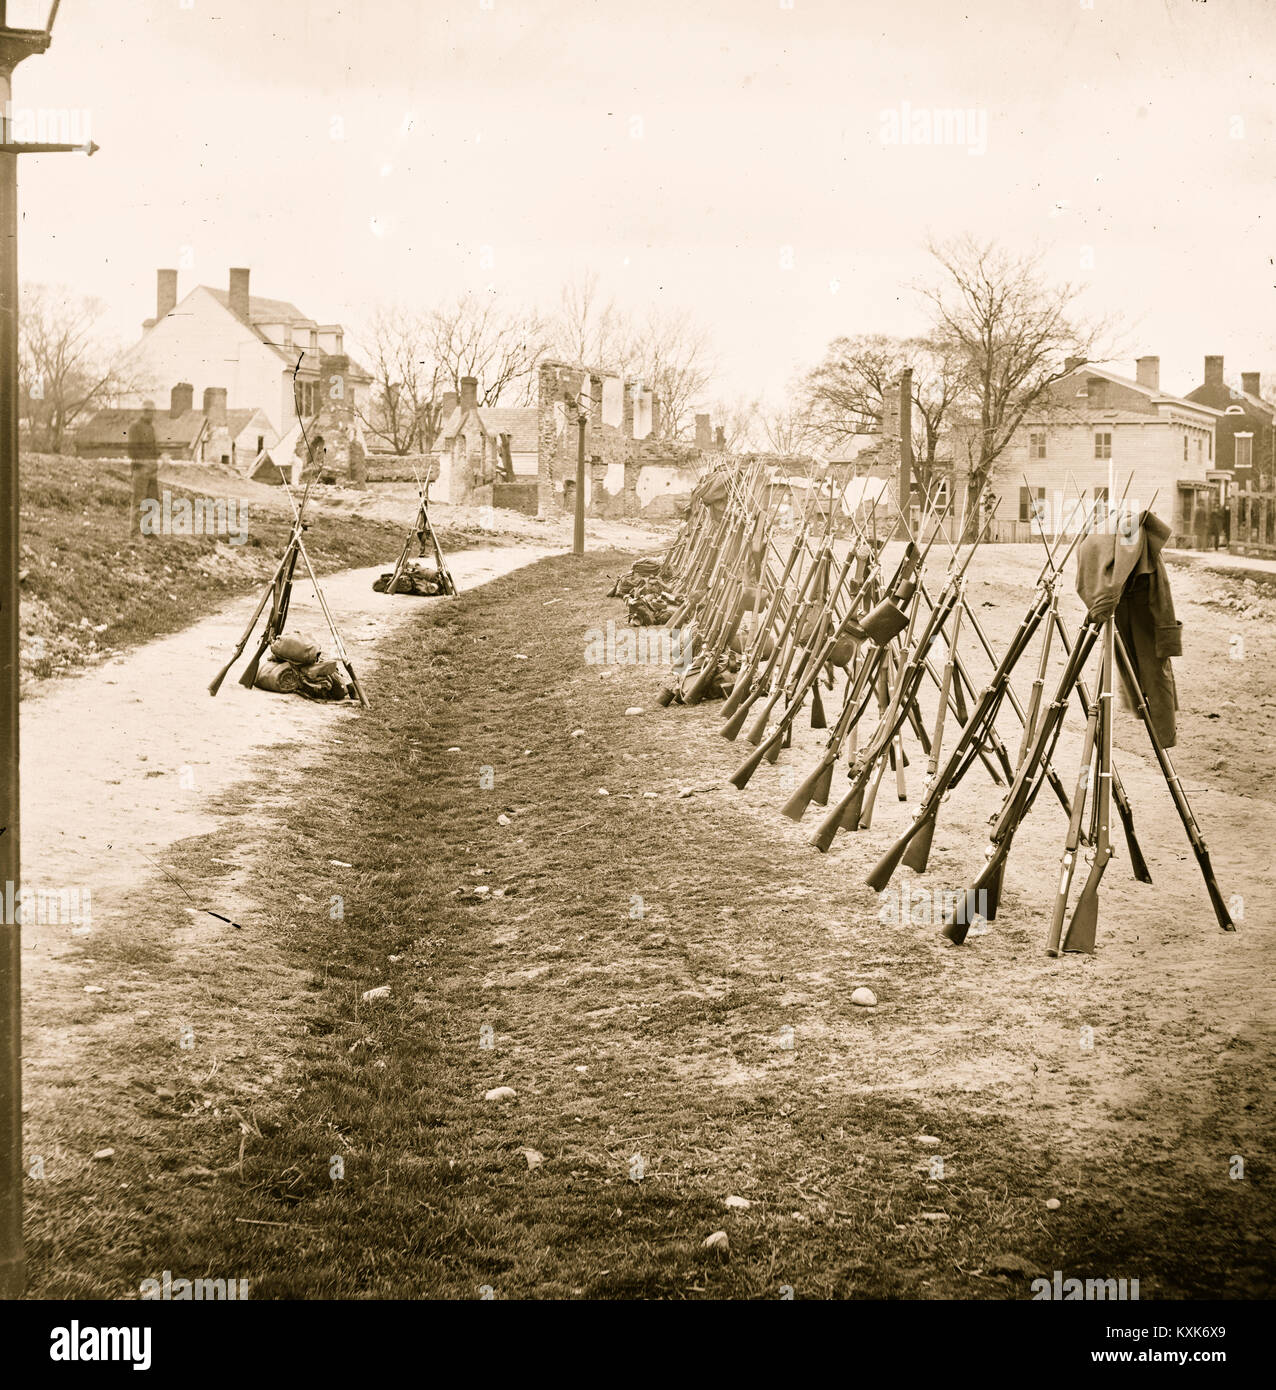 Petersburg, Va. Row of stacked Federal rifles; houses beyond - Stock Image